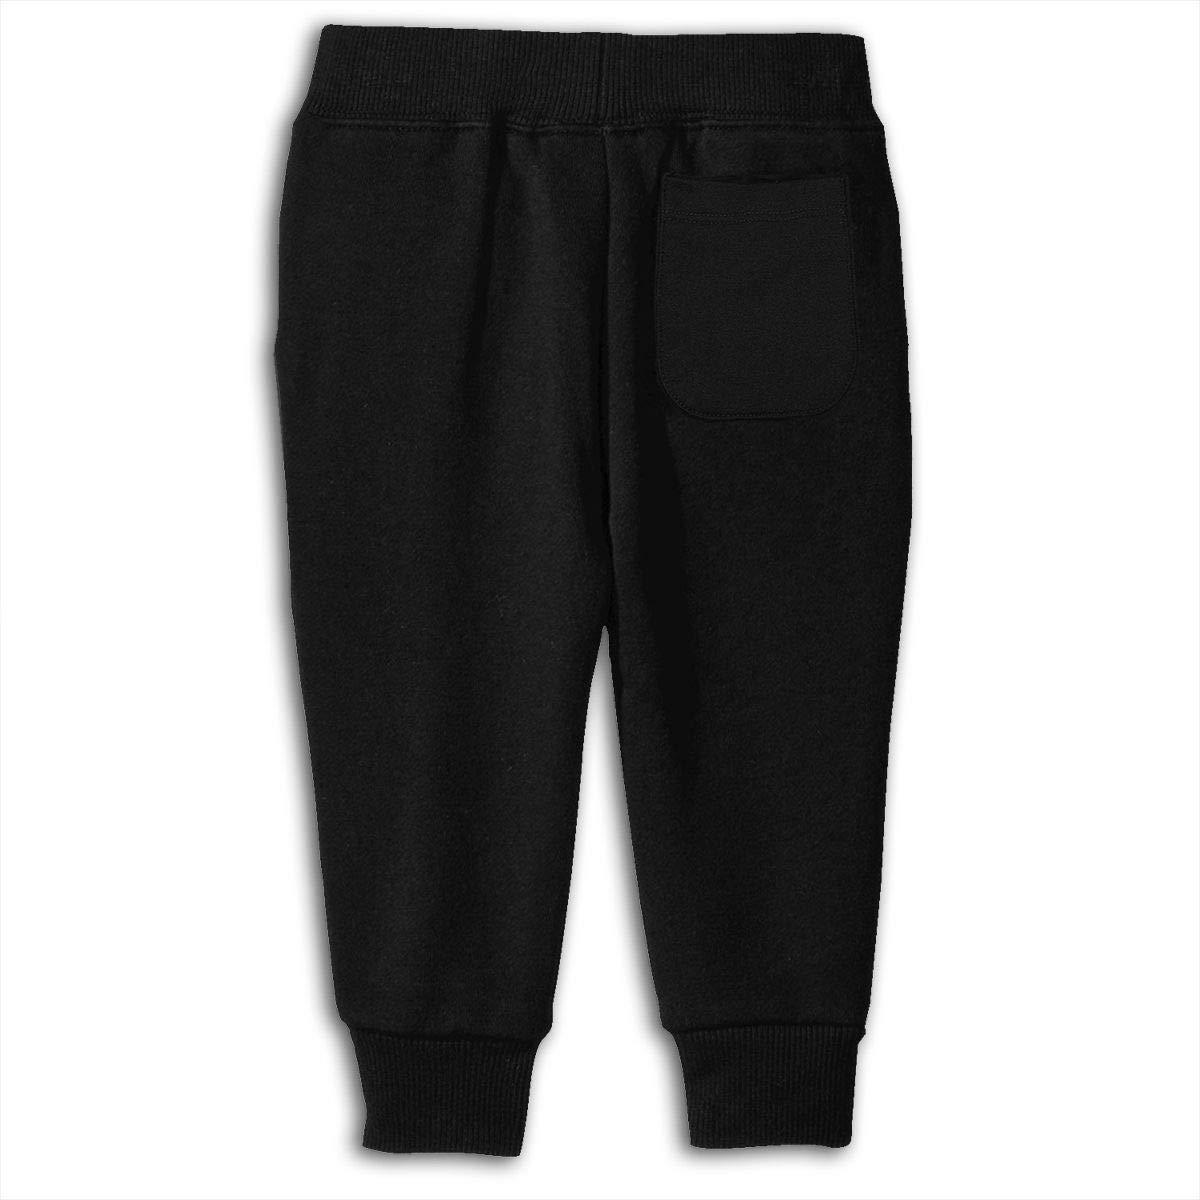 ShineFun Printed NRA Child Boys Girls Unisex Fashion Sweatpants